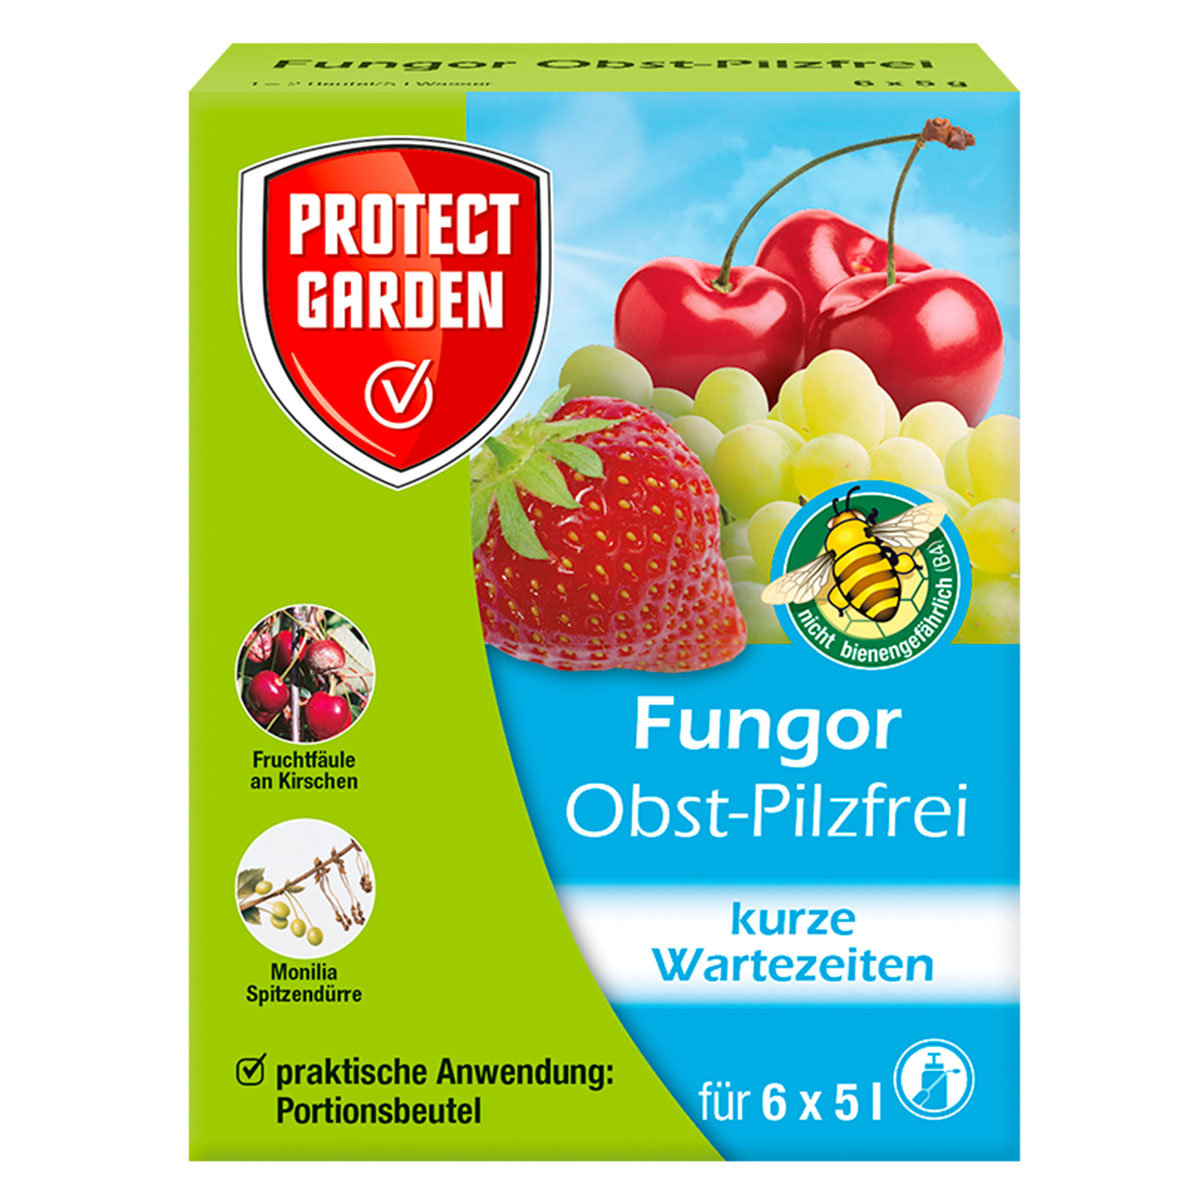 Protect Garden Fungor Obst-Pilzfrei, 6 x 5 g Beutel